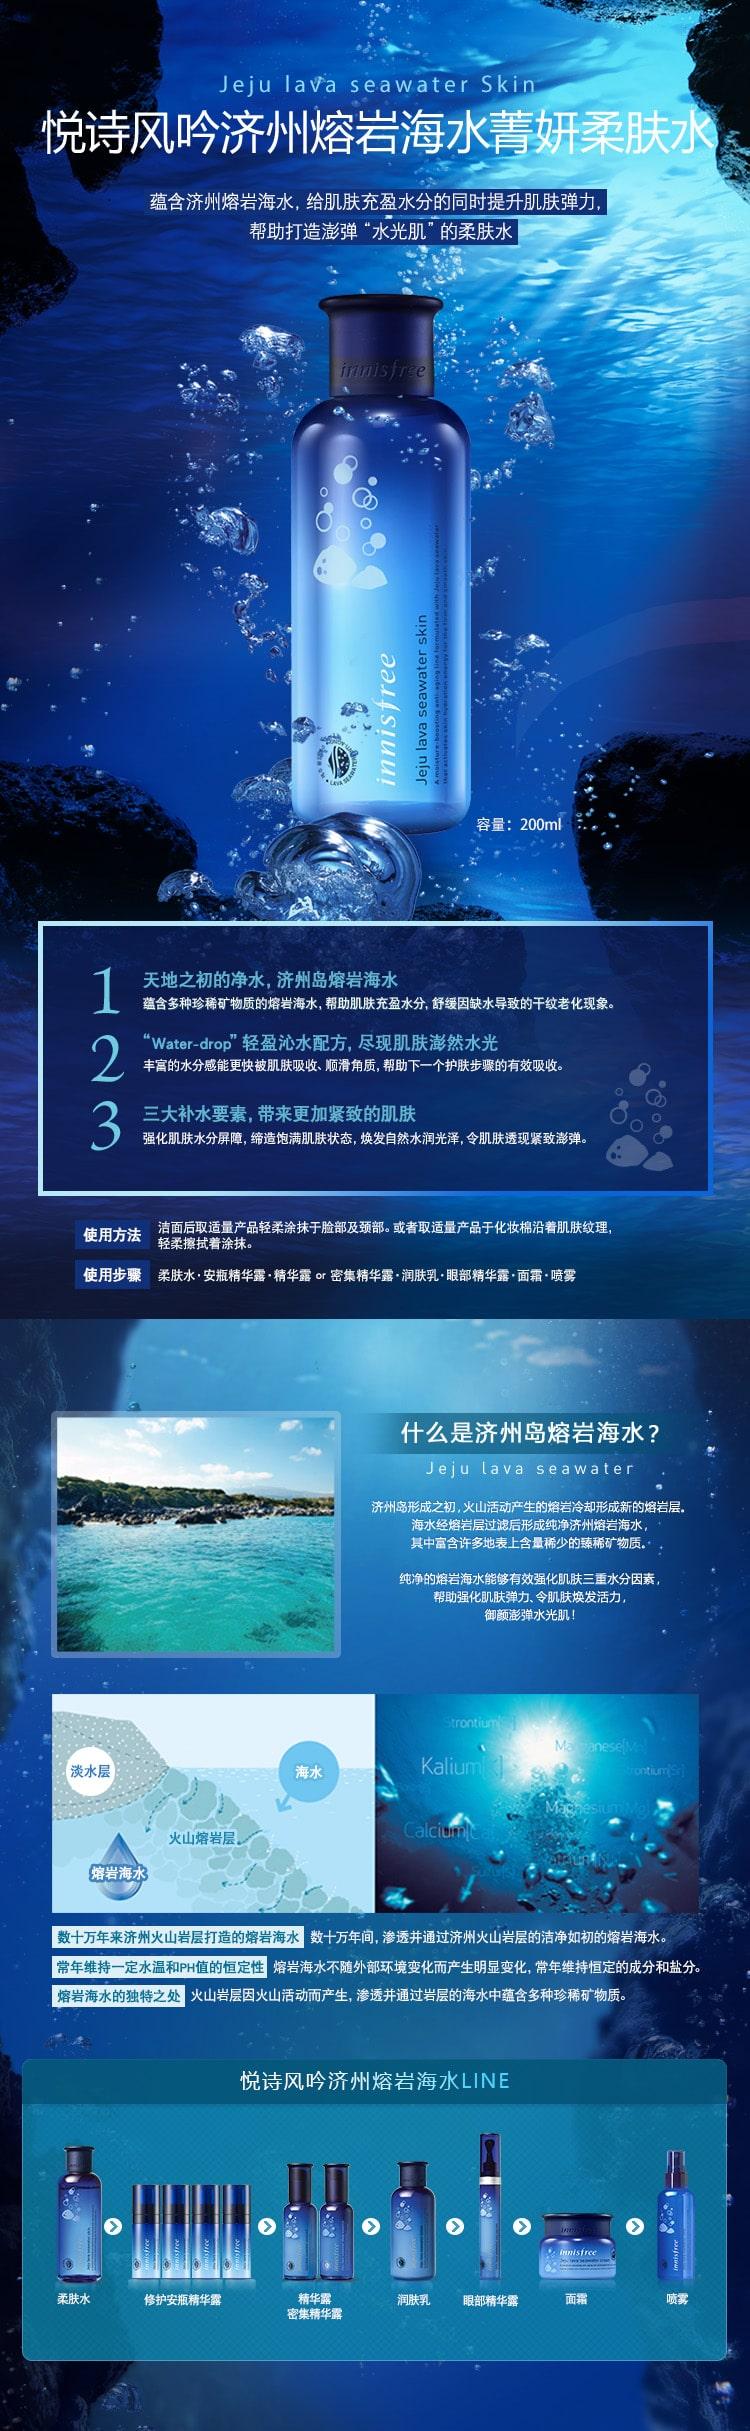 Jeju Lava Seawater Skin - Intro